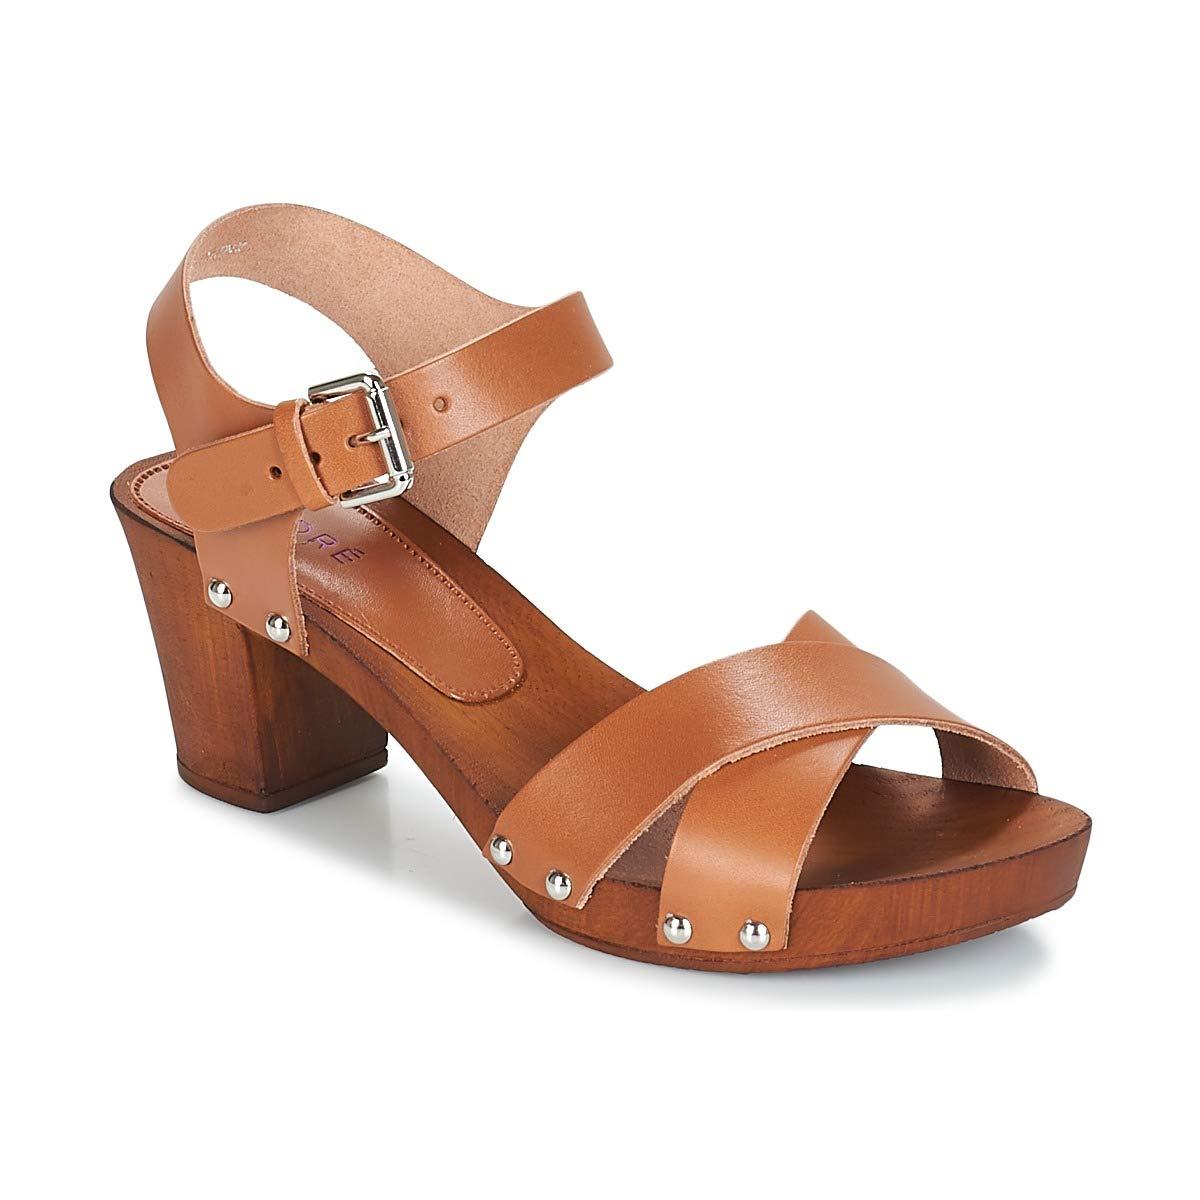 André Bongo Sandalen Sandaletten Damen Braun Sandalen Sandaletten  | Starke Hitze- und Hitzebeständigkeit